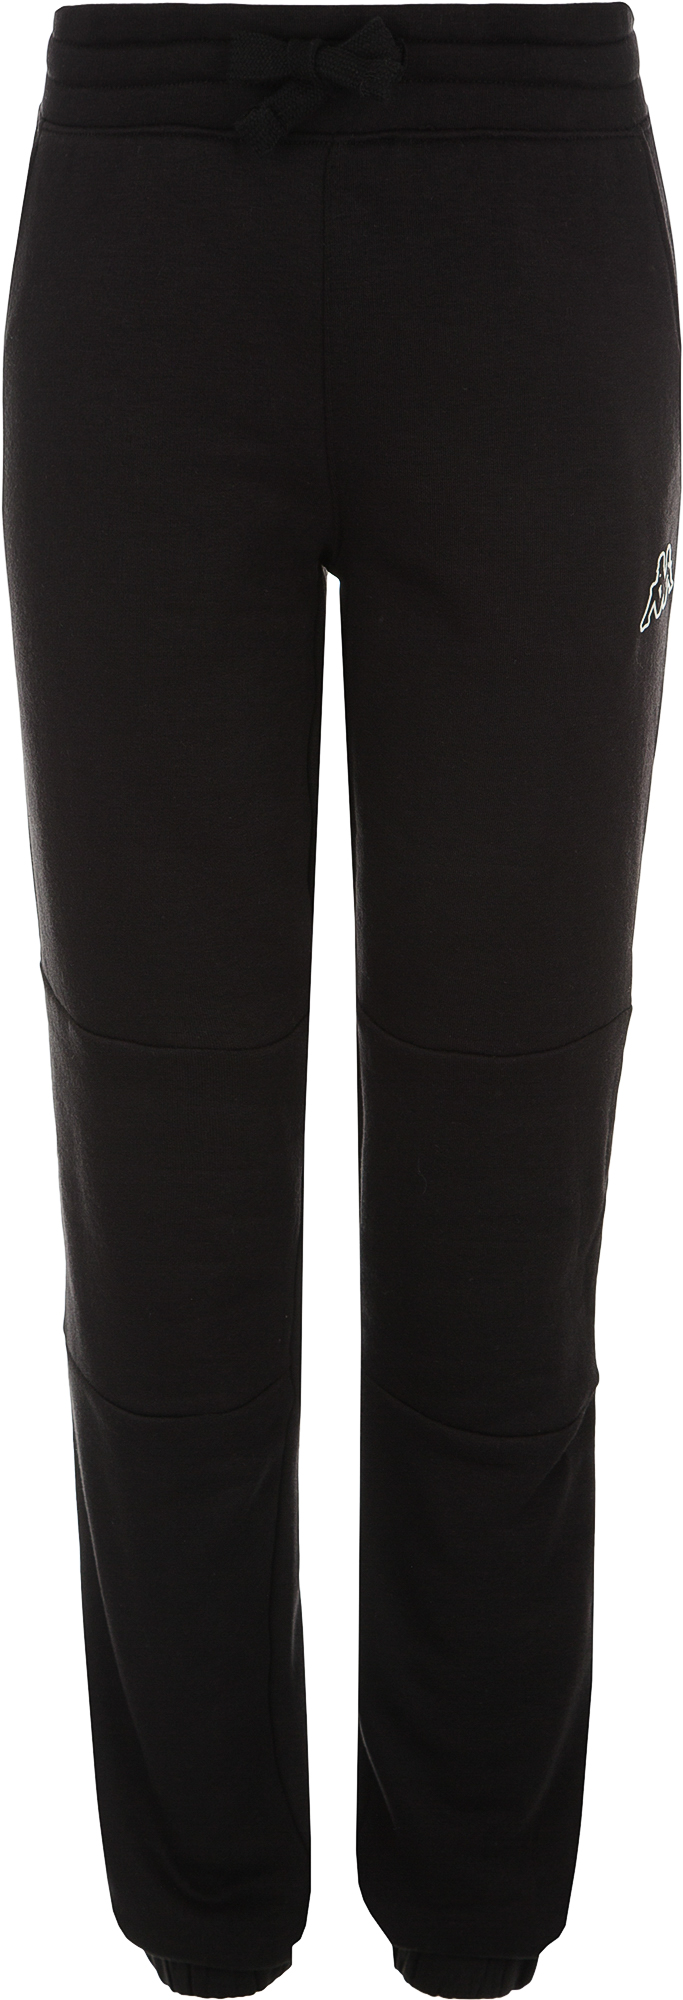 Kappa Брюки для девочек Kappa, размер 140 kappa брюки для девочек kappa размер 134